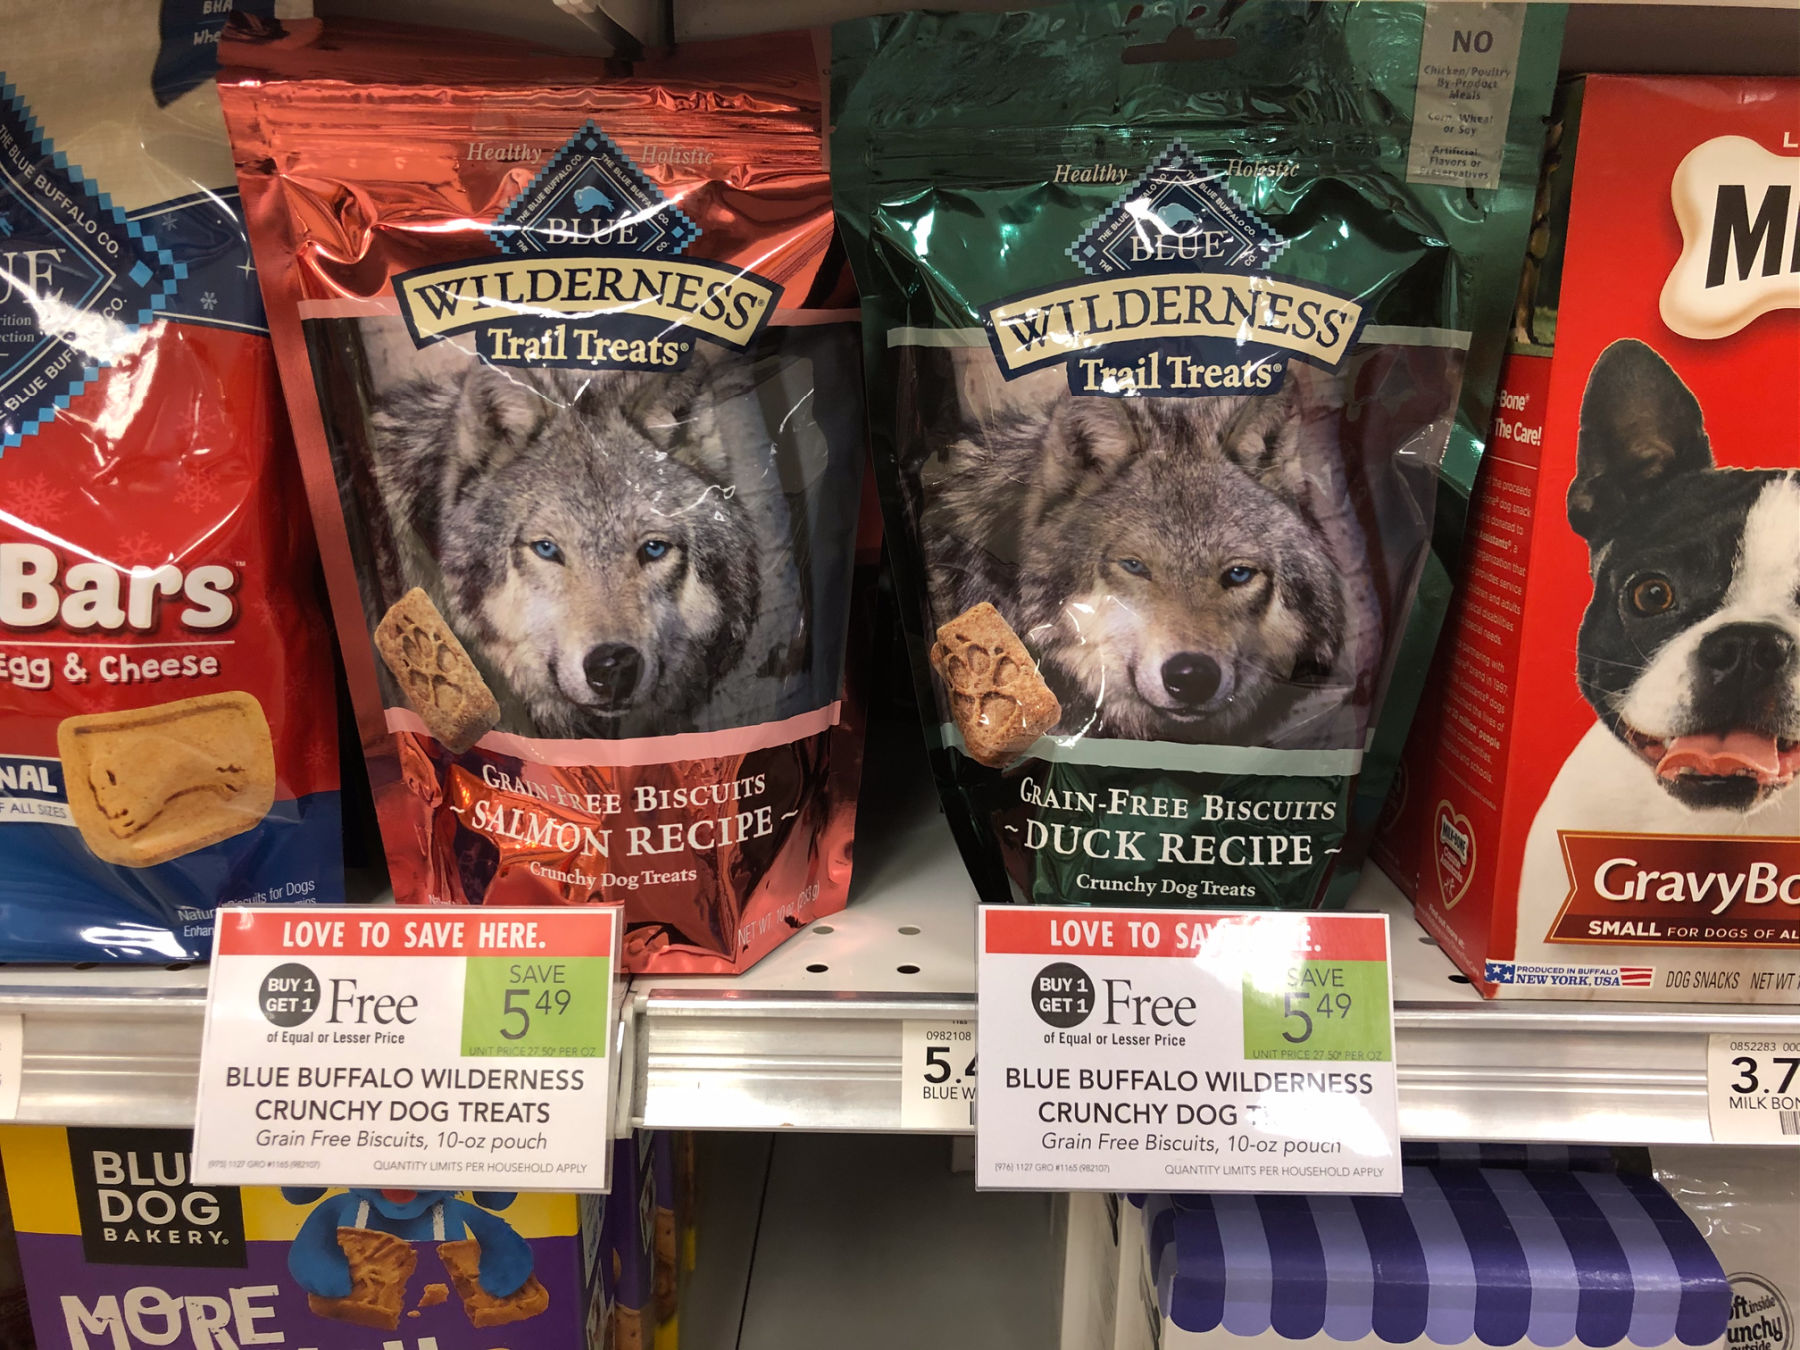 Blue Wilderness Crunchy Dog Treats Just $1.75 At Publix on I Heart Publix 1